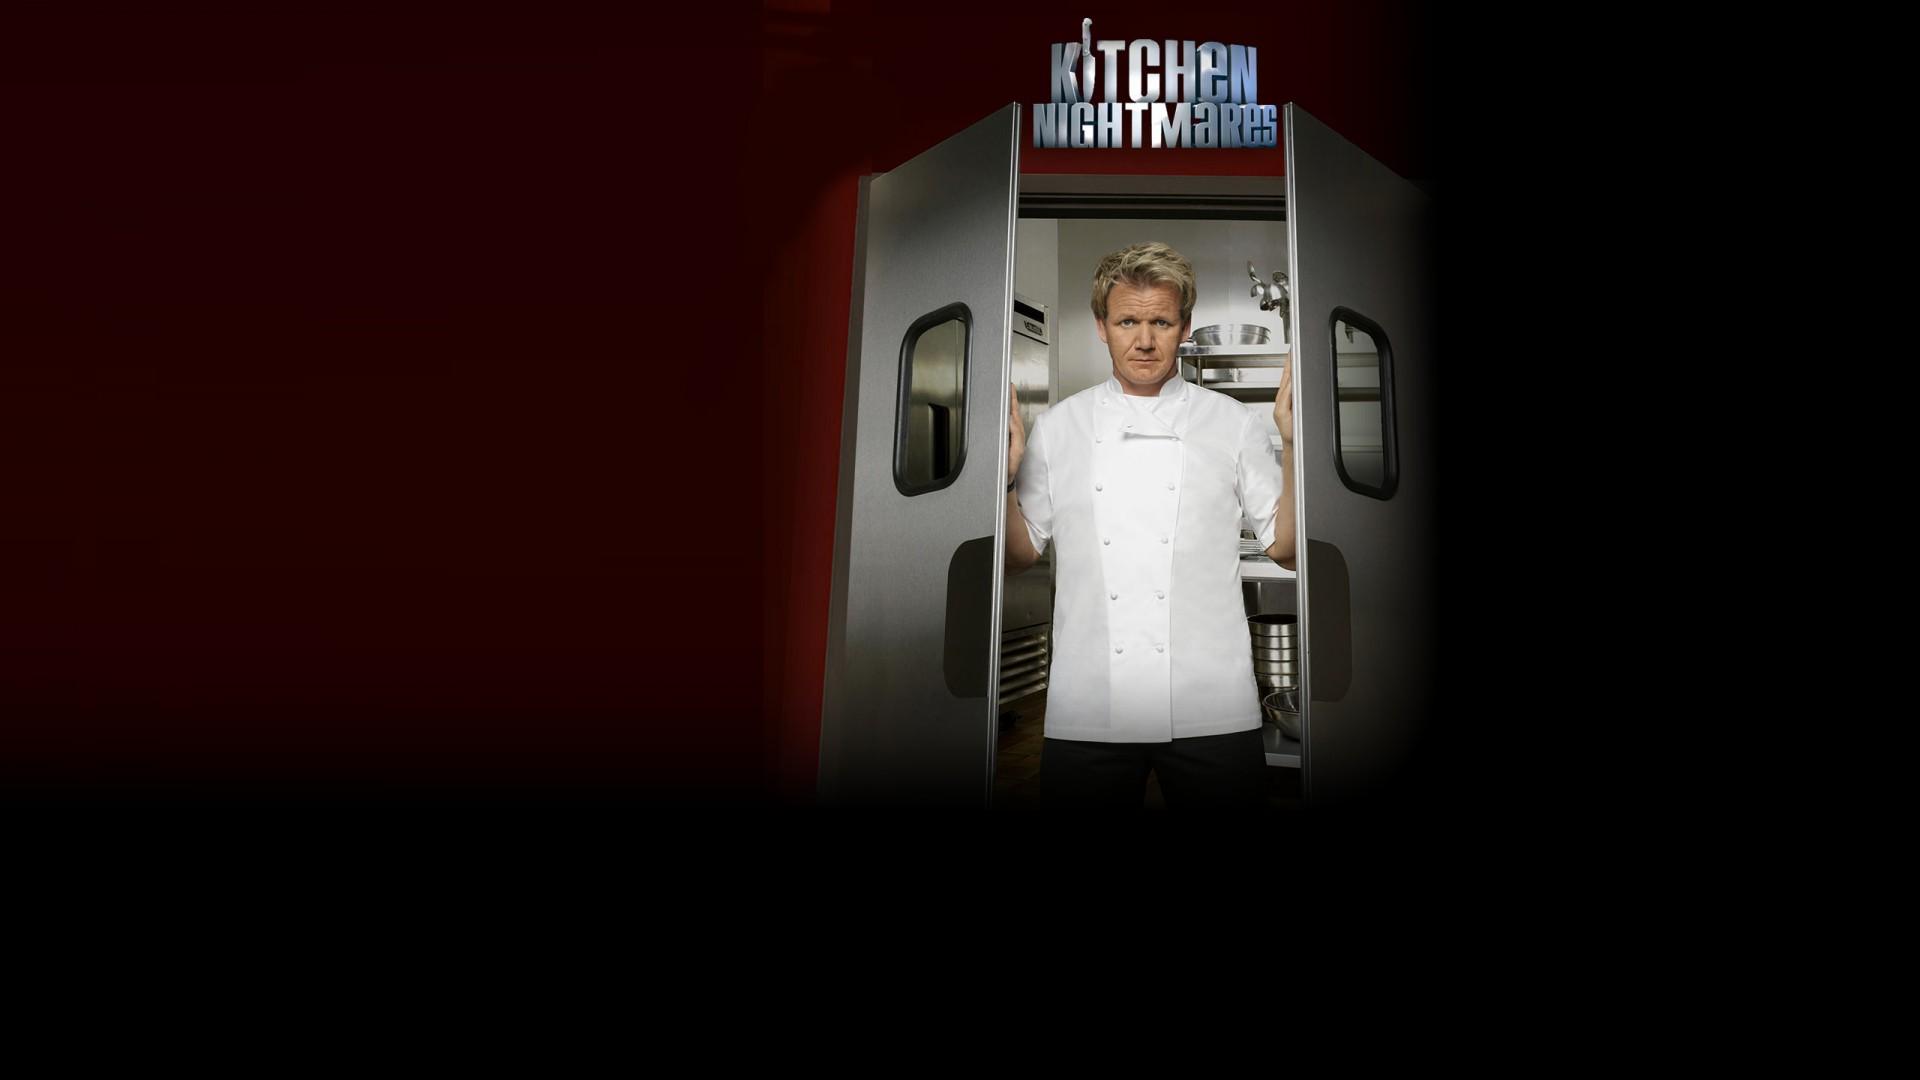 Ramsay S Kitchen Nightmares Box Set  Discs